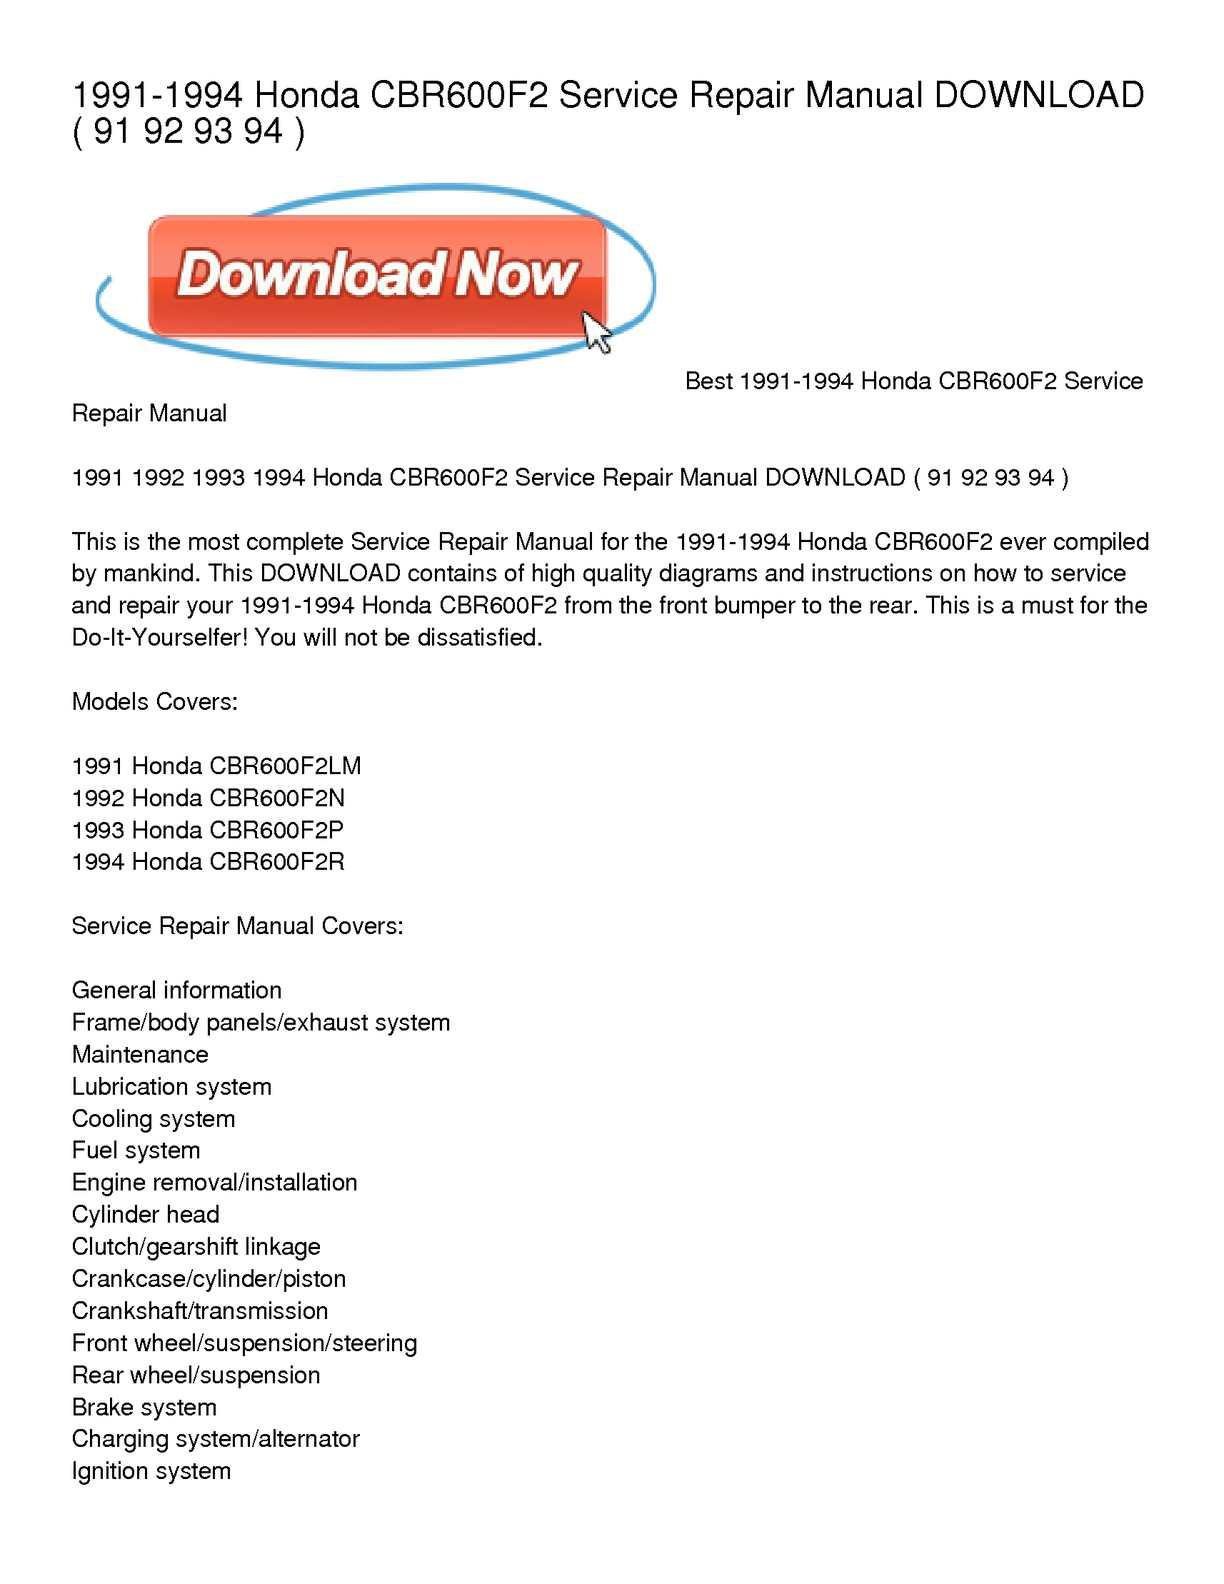 Calamo 1991 1994 Honda Cbr600f2 Service Repair Manual Download Cbr 600 Wire Diagram Wiring Schematic